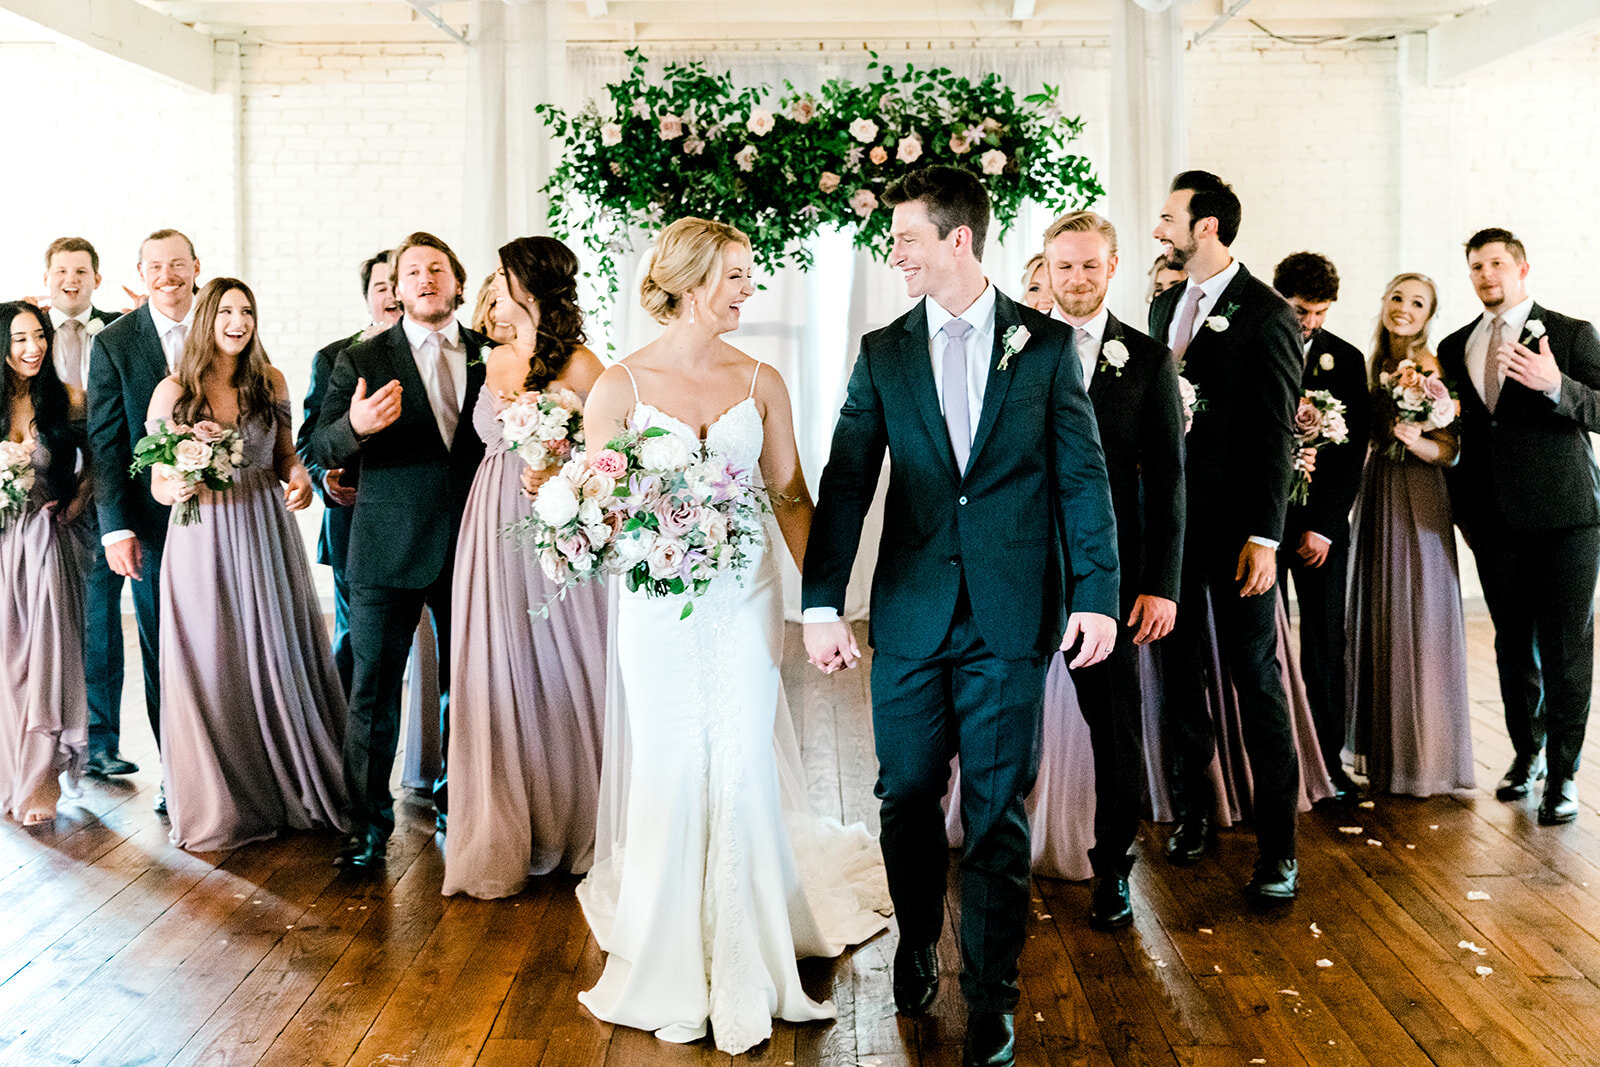 wedding party portraits.jpg